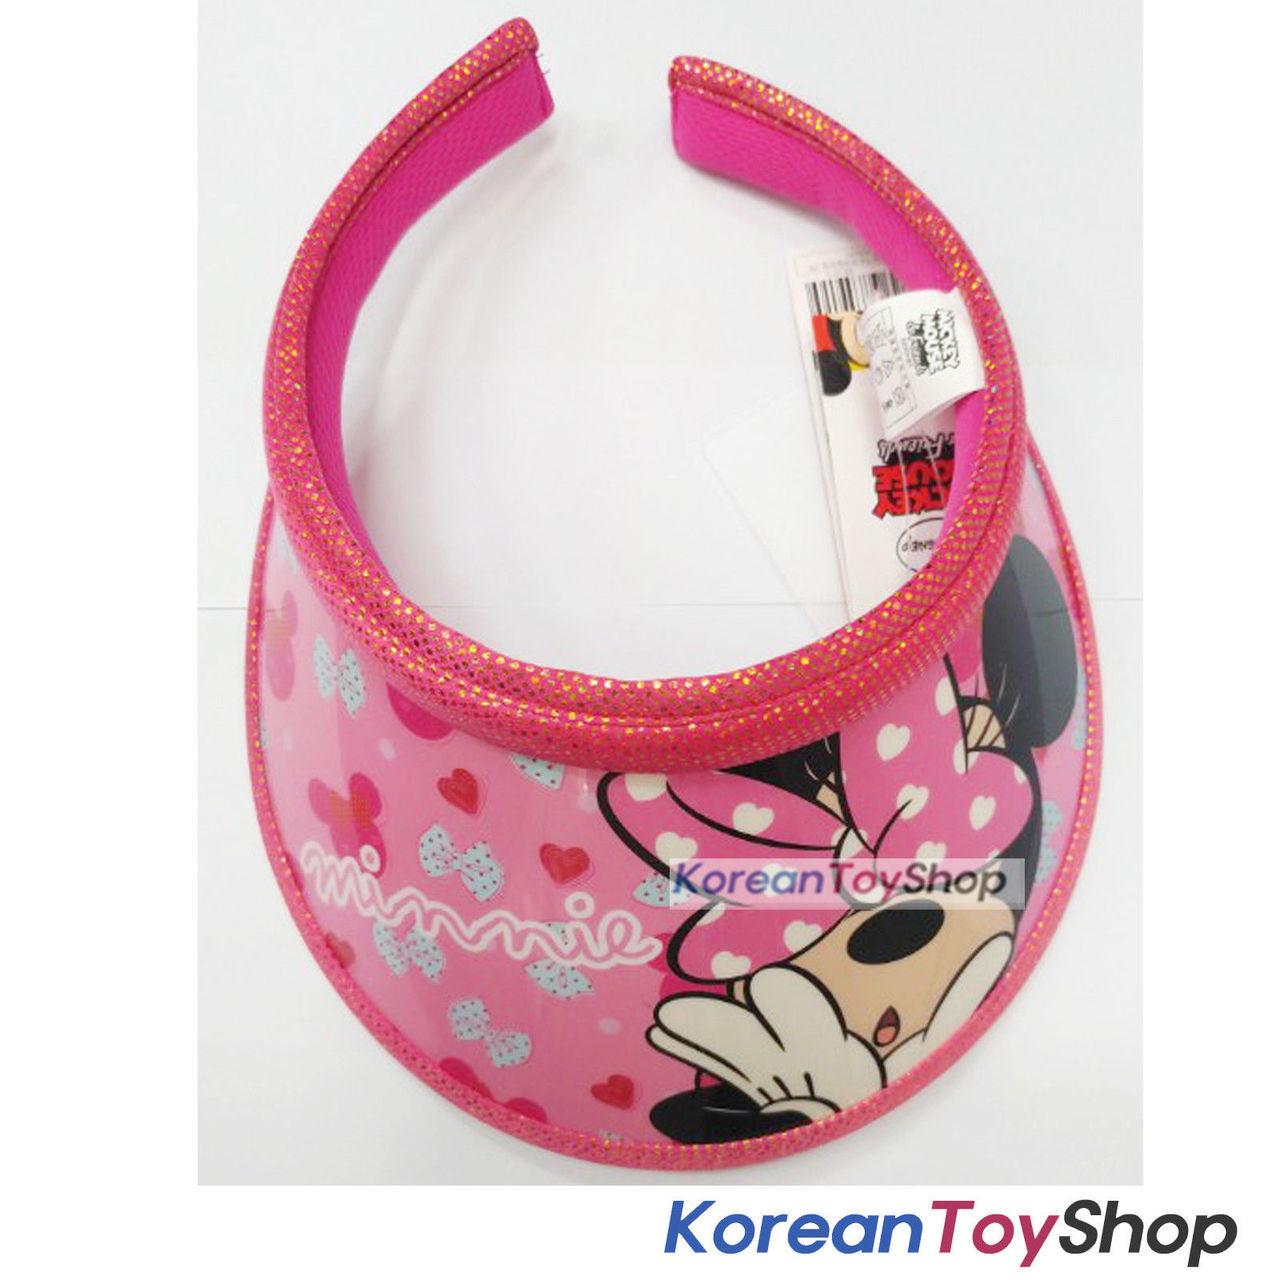 Disney Minnie Mouse Visor Hat Sun Cap Kids Girl Pink Original -  KoreanToyShop 13289e7aa2d8